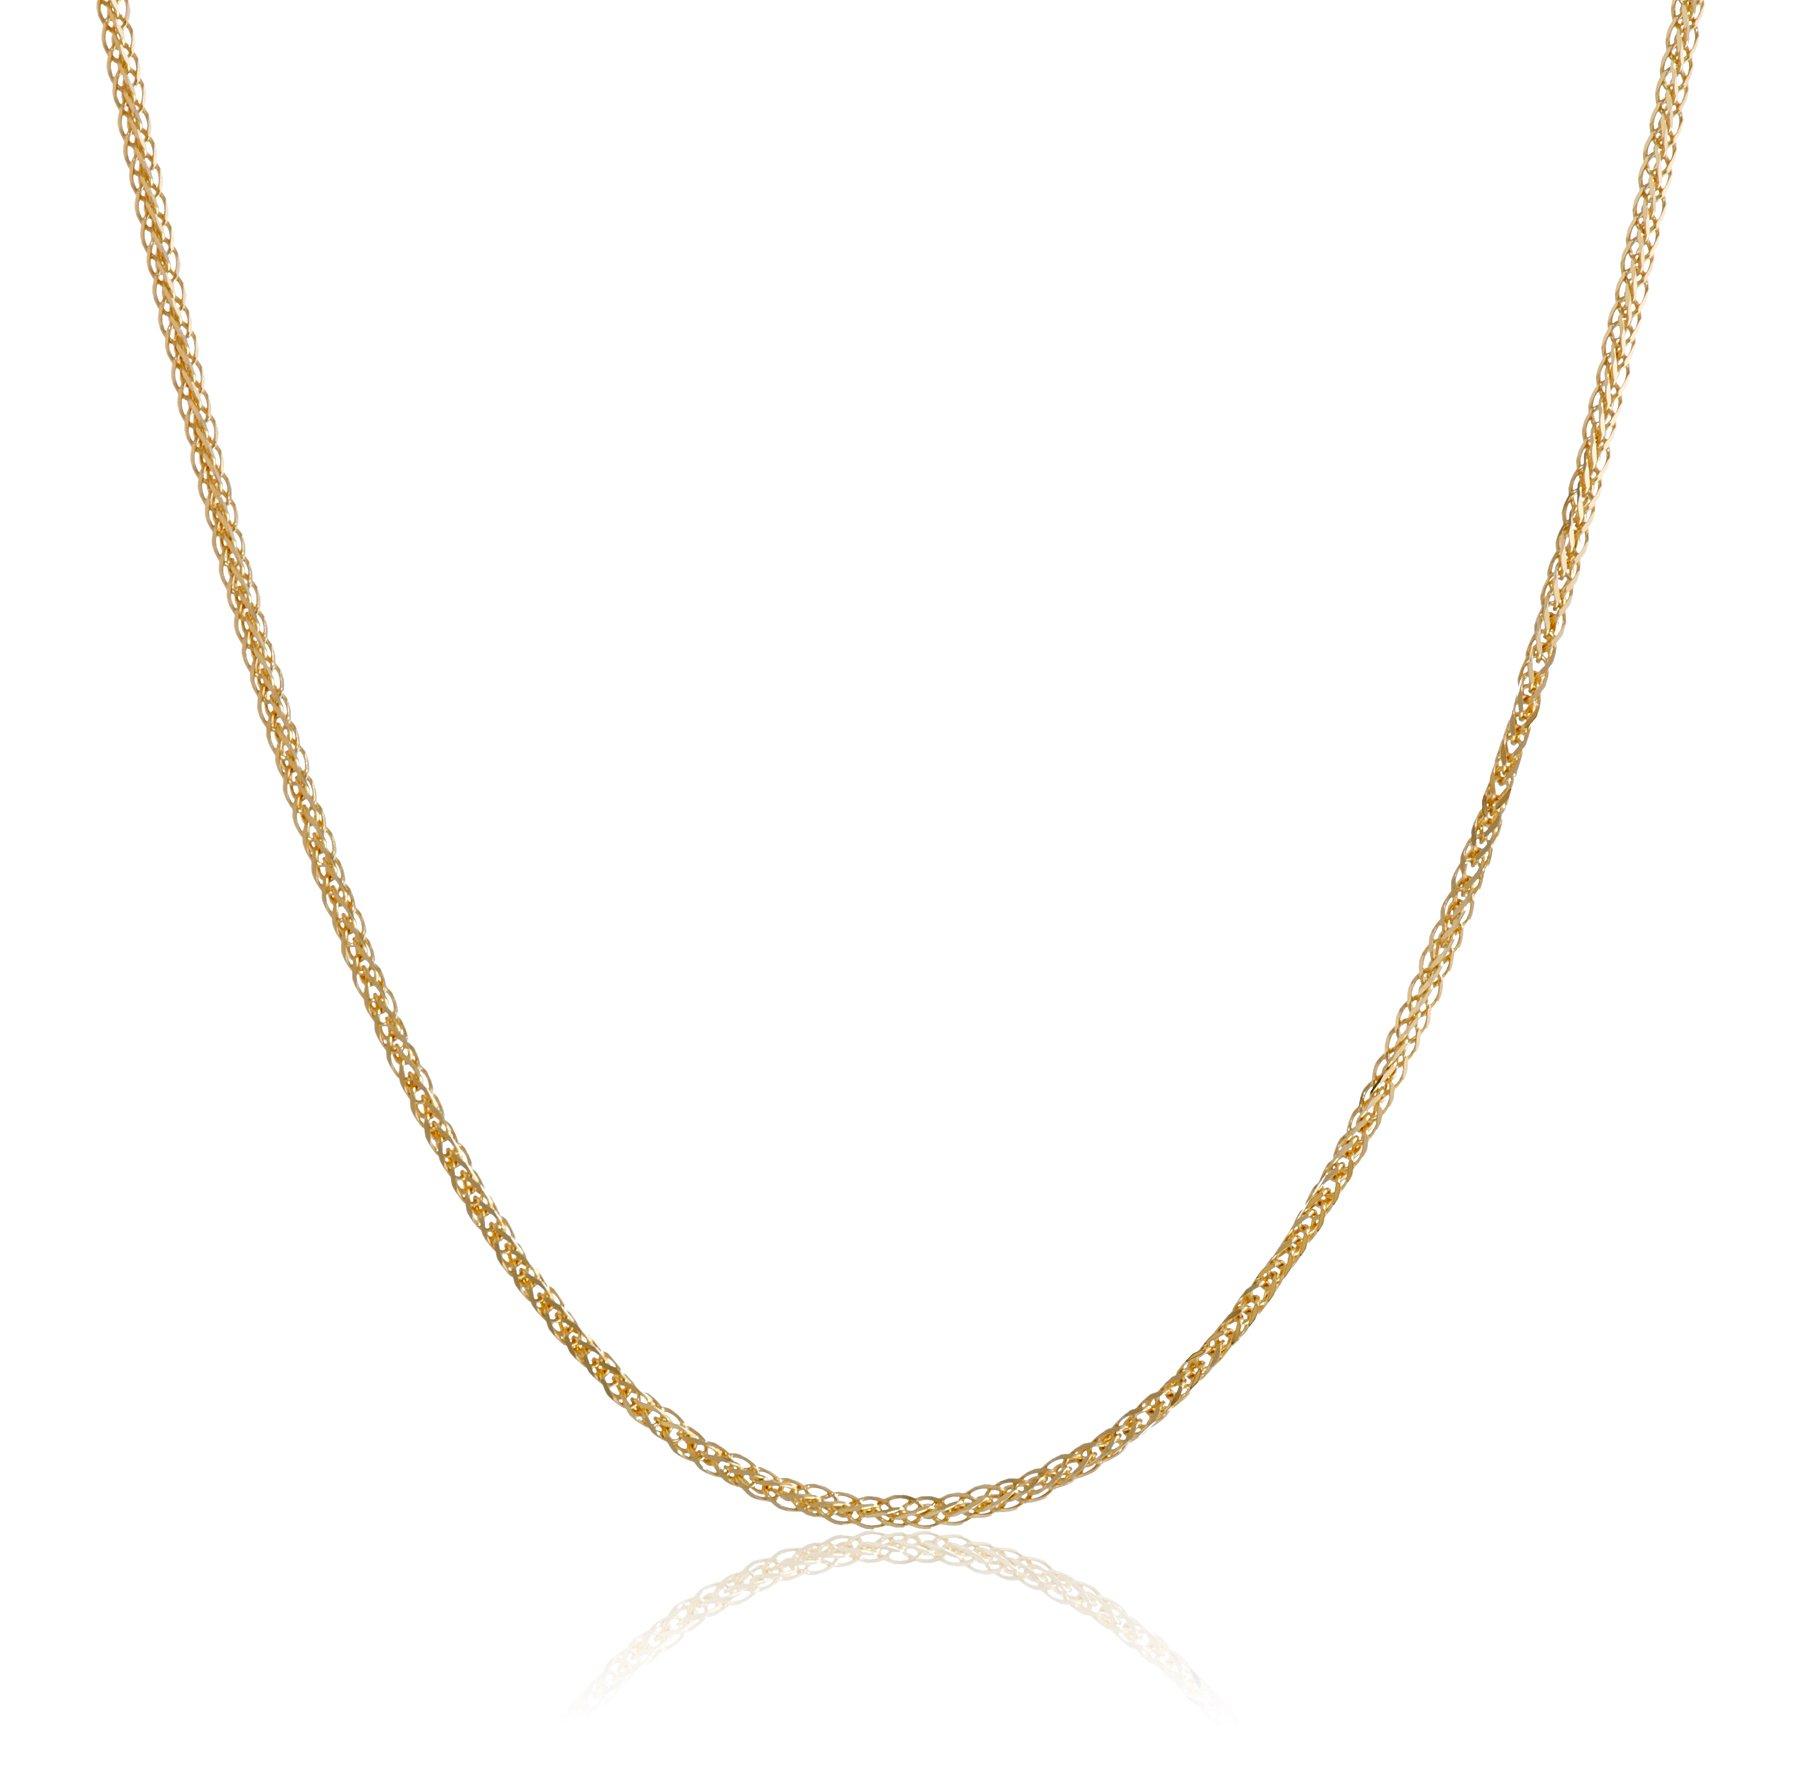 18k Yellow Gold Diamond-Cut Wheat Chain Necklace, 18''